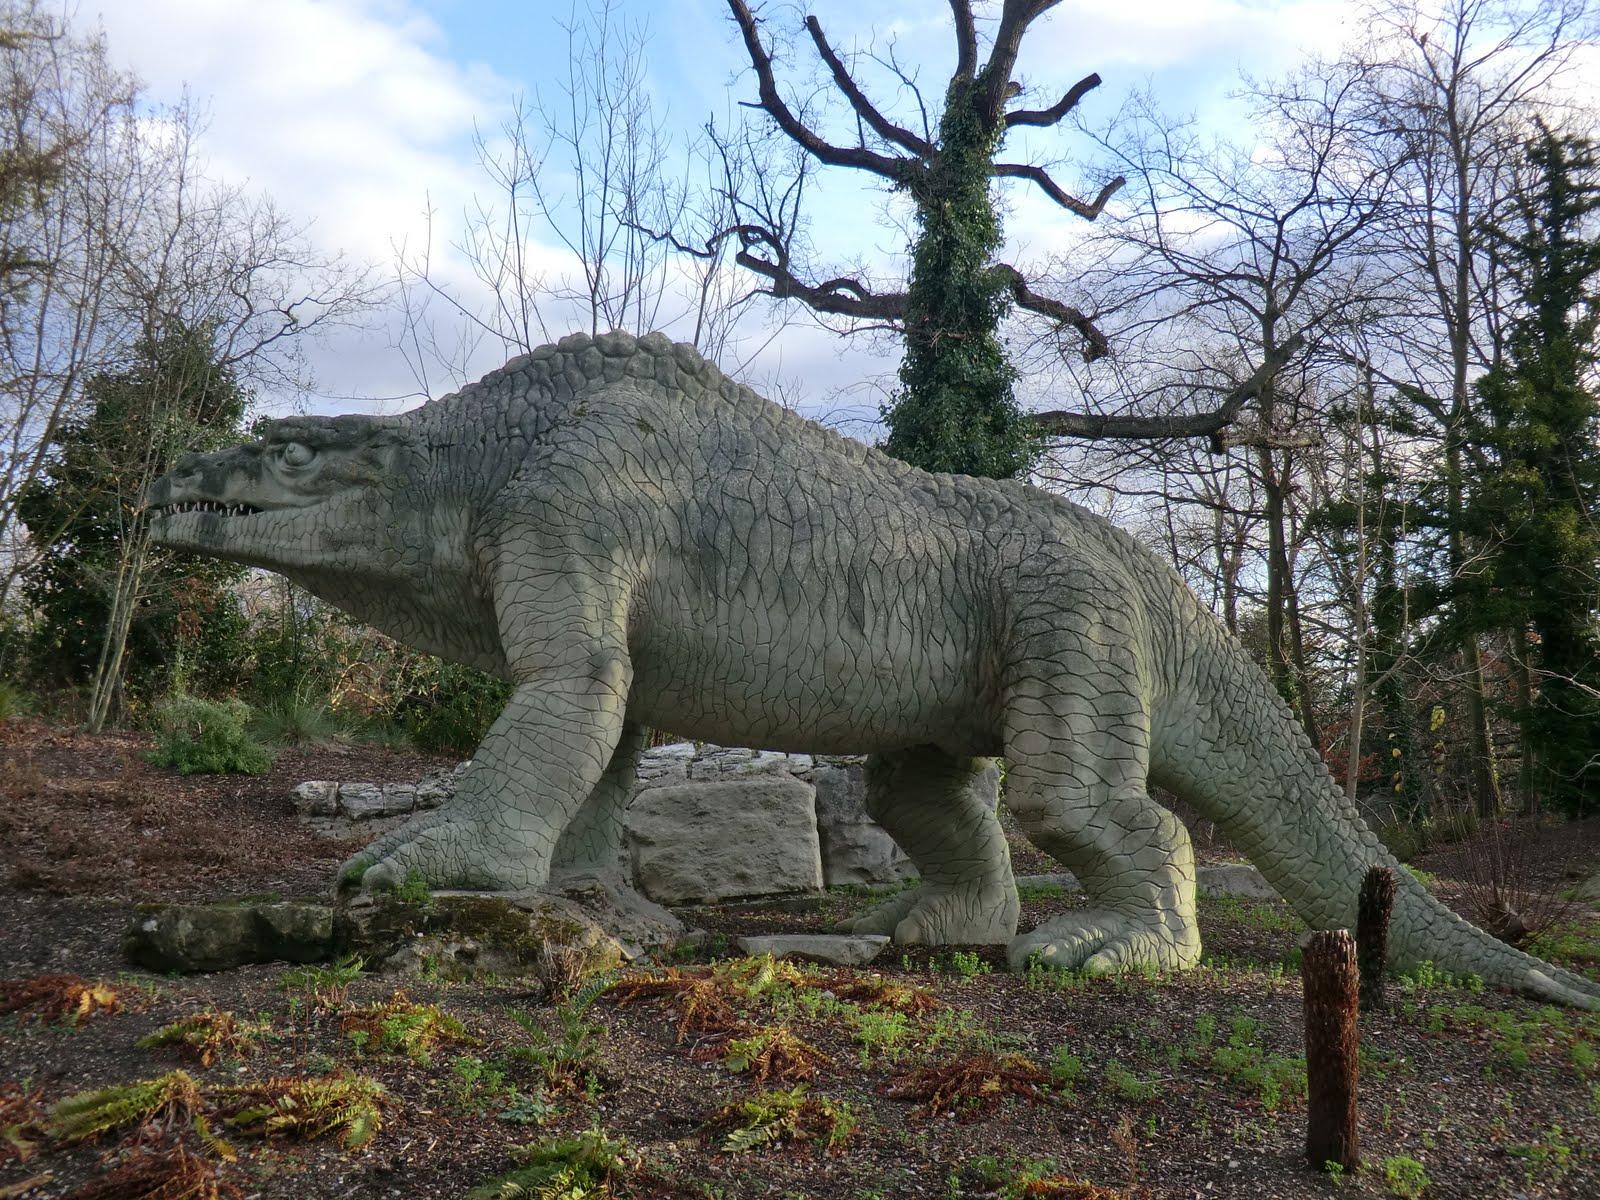 CIMG1499 Megalosaurus, Crystal Palace Park